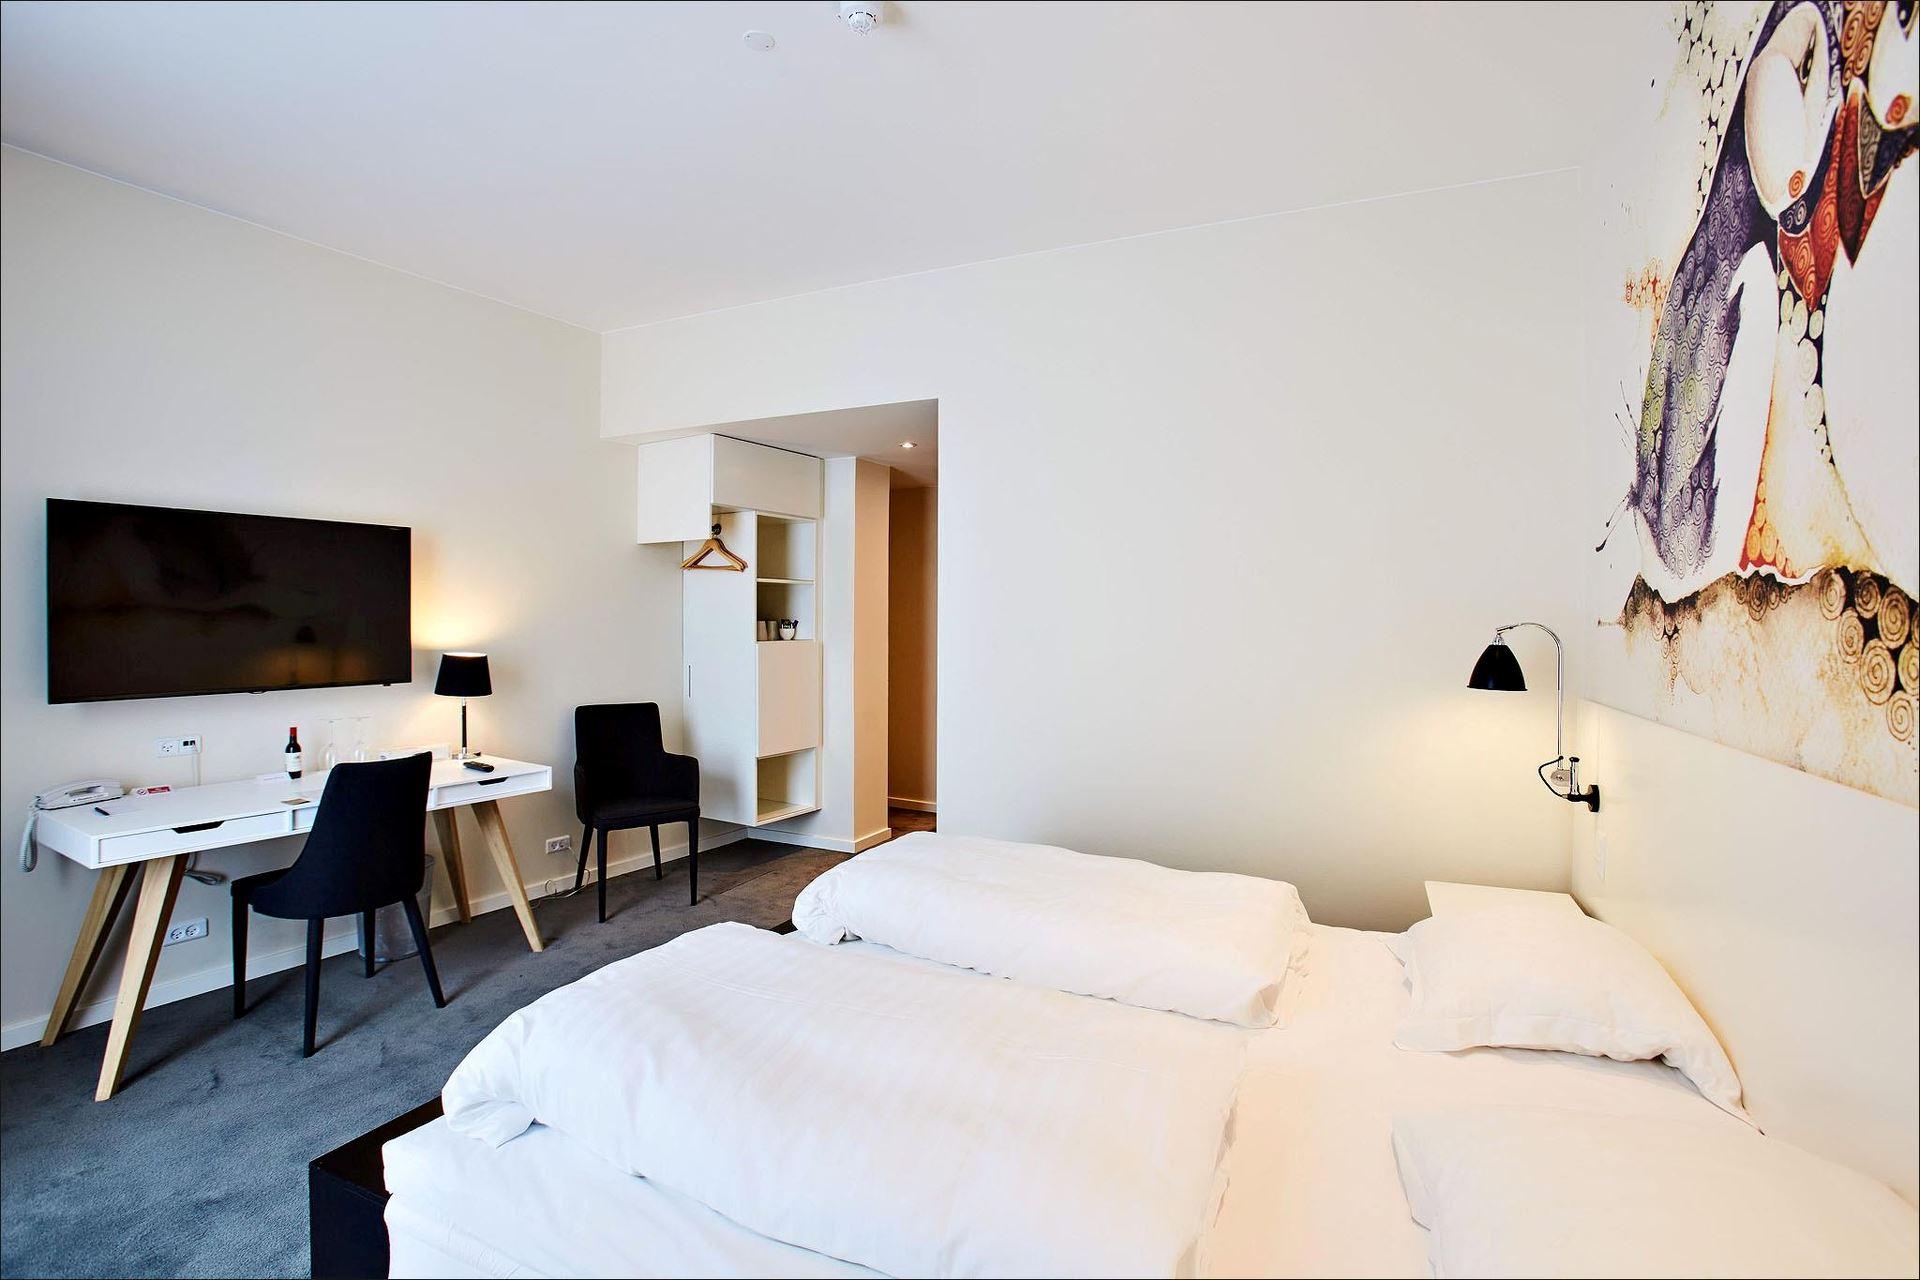 New Nordic room at Hotel Hafnia ©Hotel Hafnia